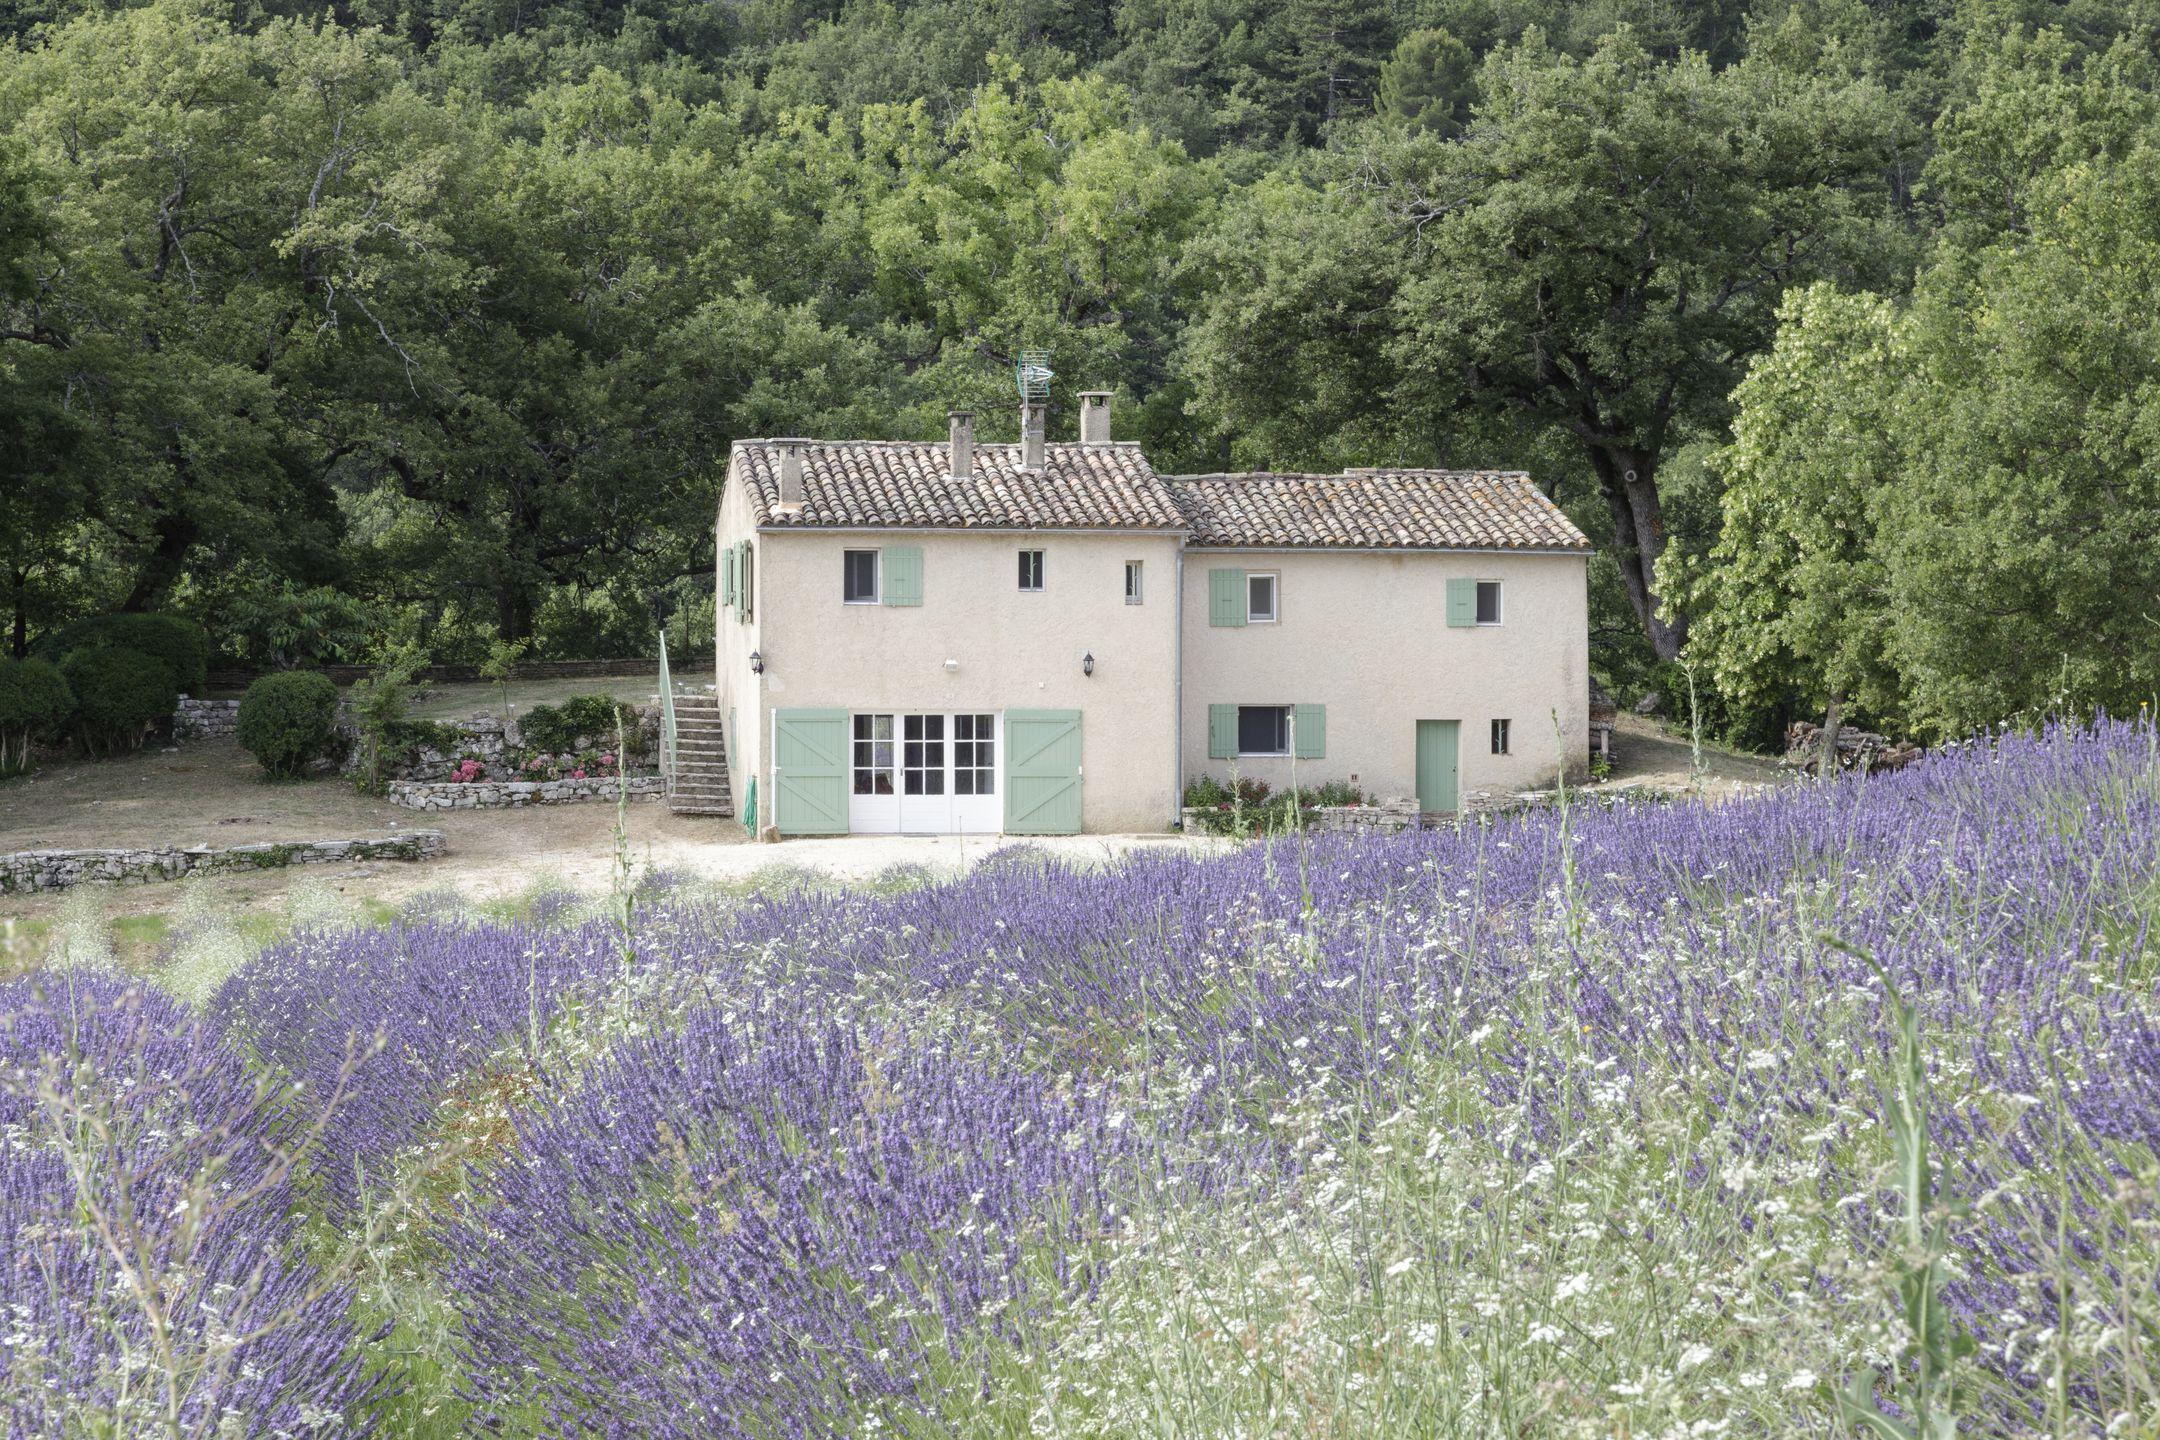 20210703-Provence-09-40-47-002